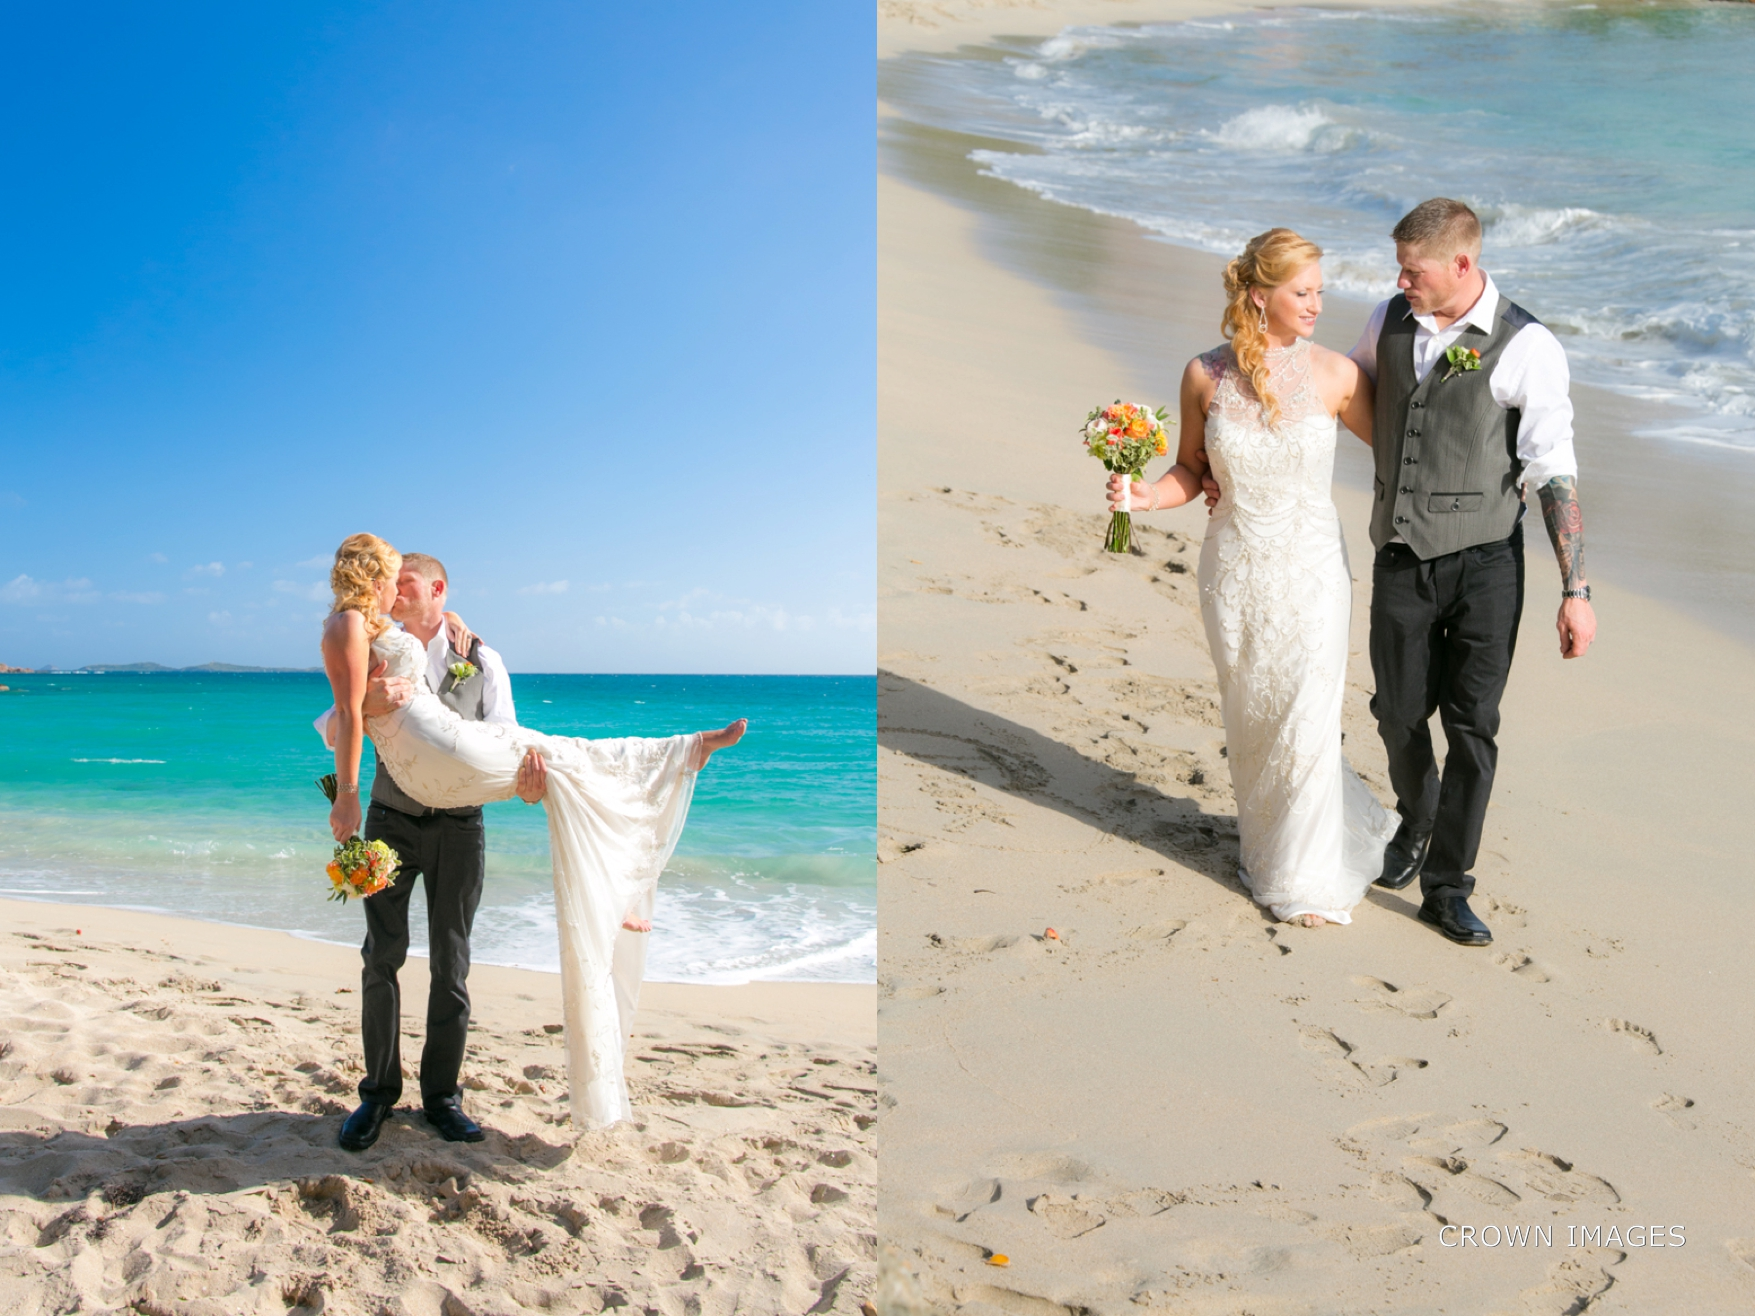 wedding_photos_saint_thomas_crown_images_0600.jpg